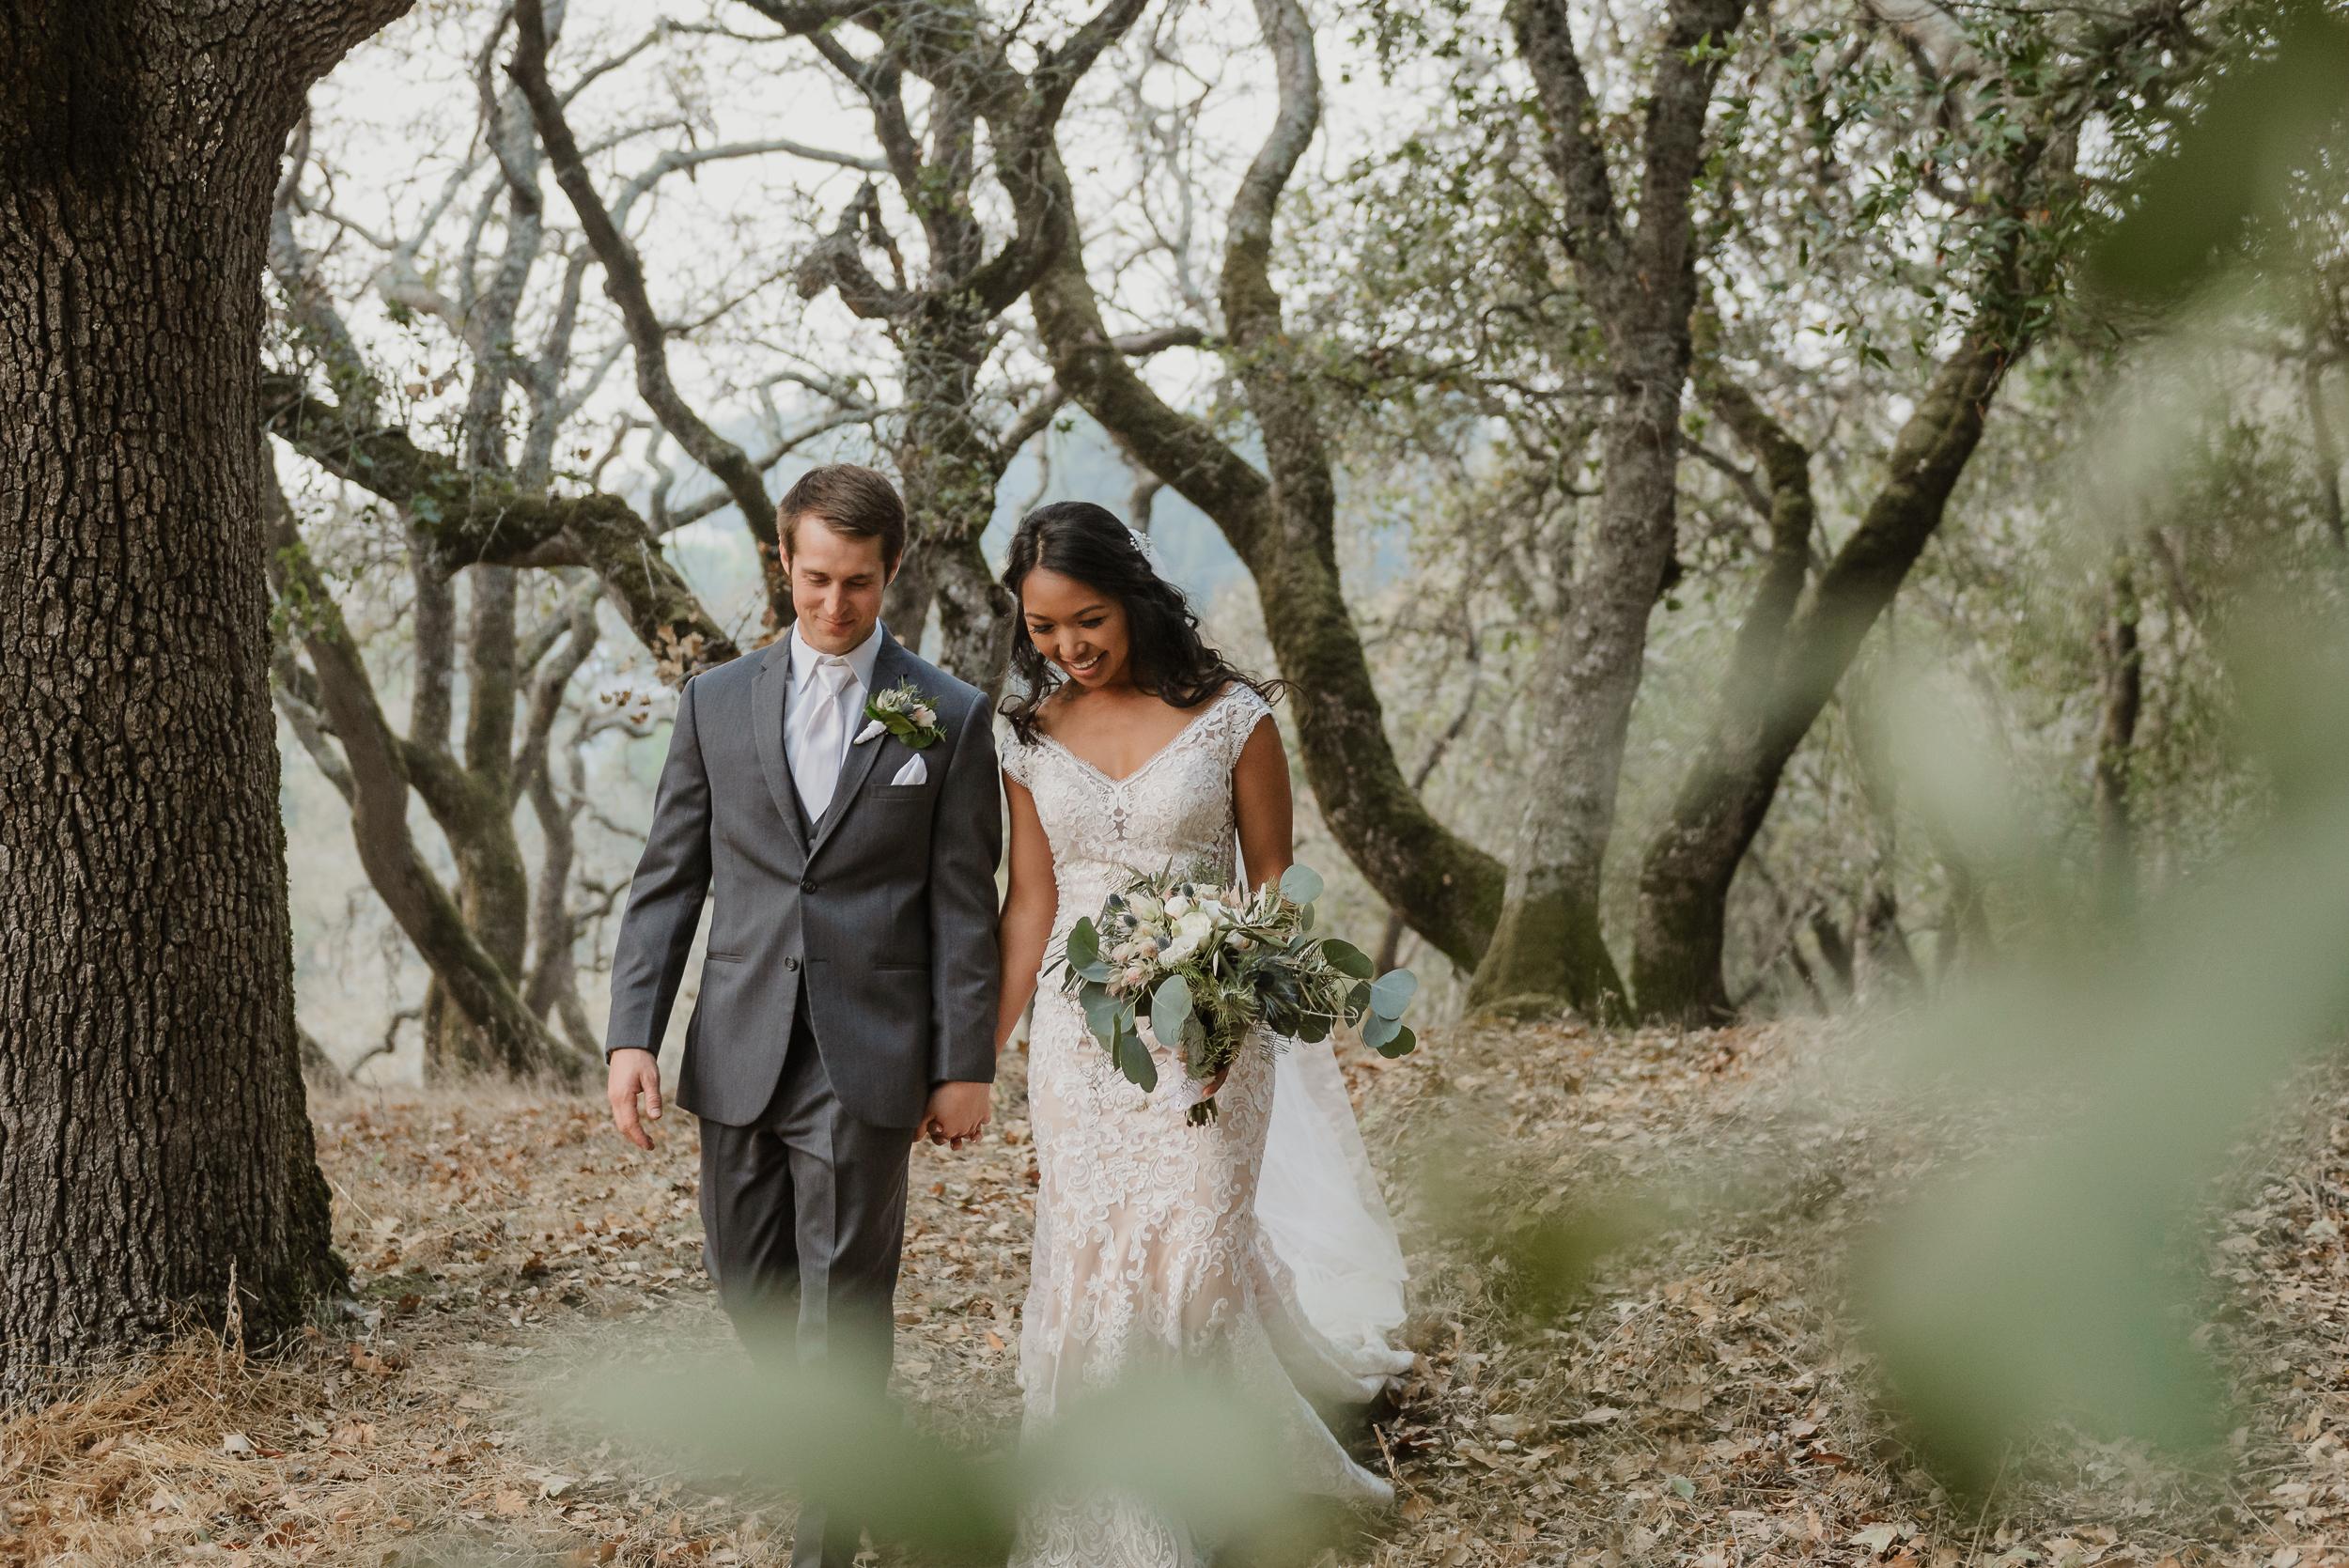 072marin-petaluma-backyard-wedding-vivianchen-500.jpg